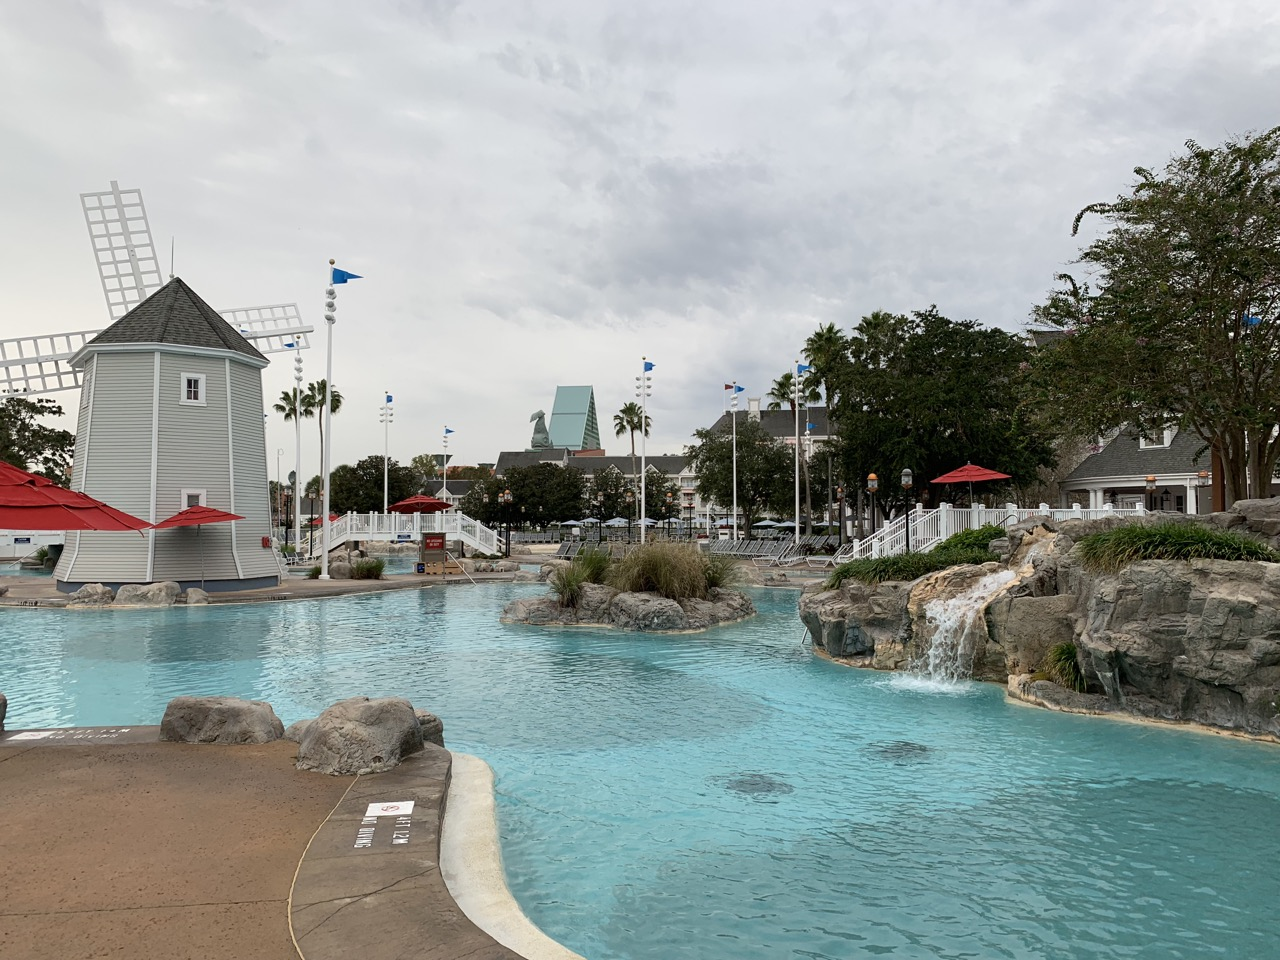 disney world best deluxe resort hotel ranking 06 yacht club stormalong bay.jpeg